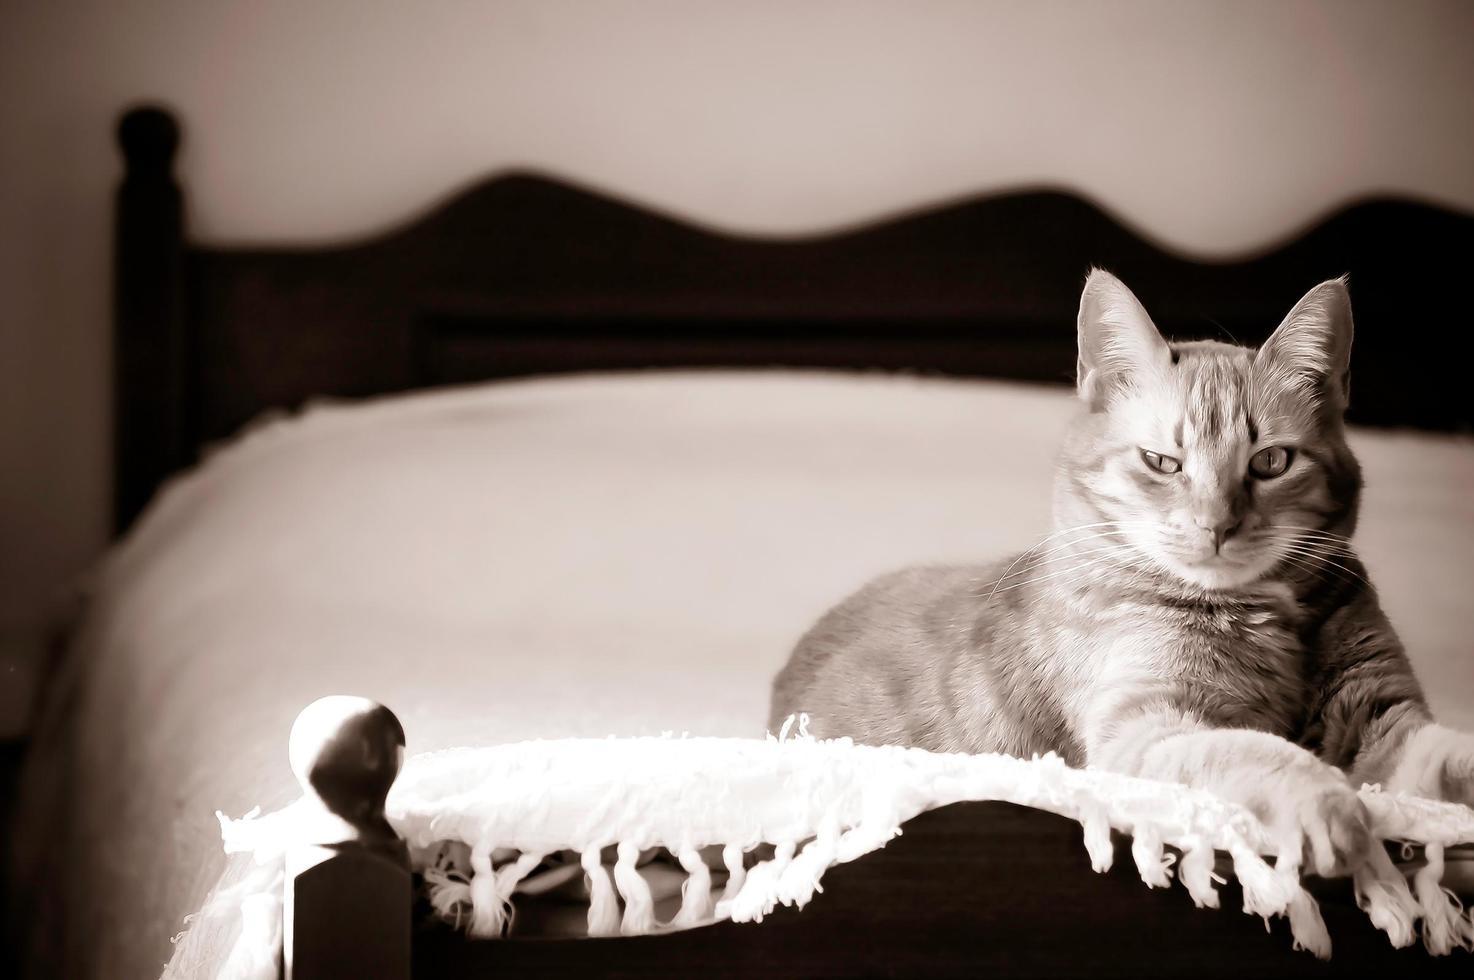 verdacht uitziende kat foto